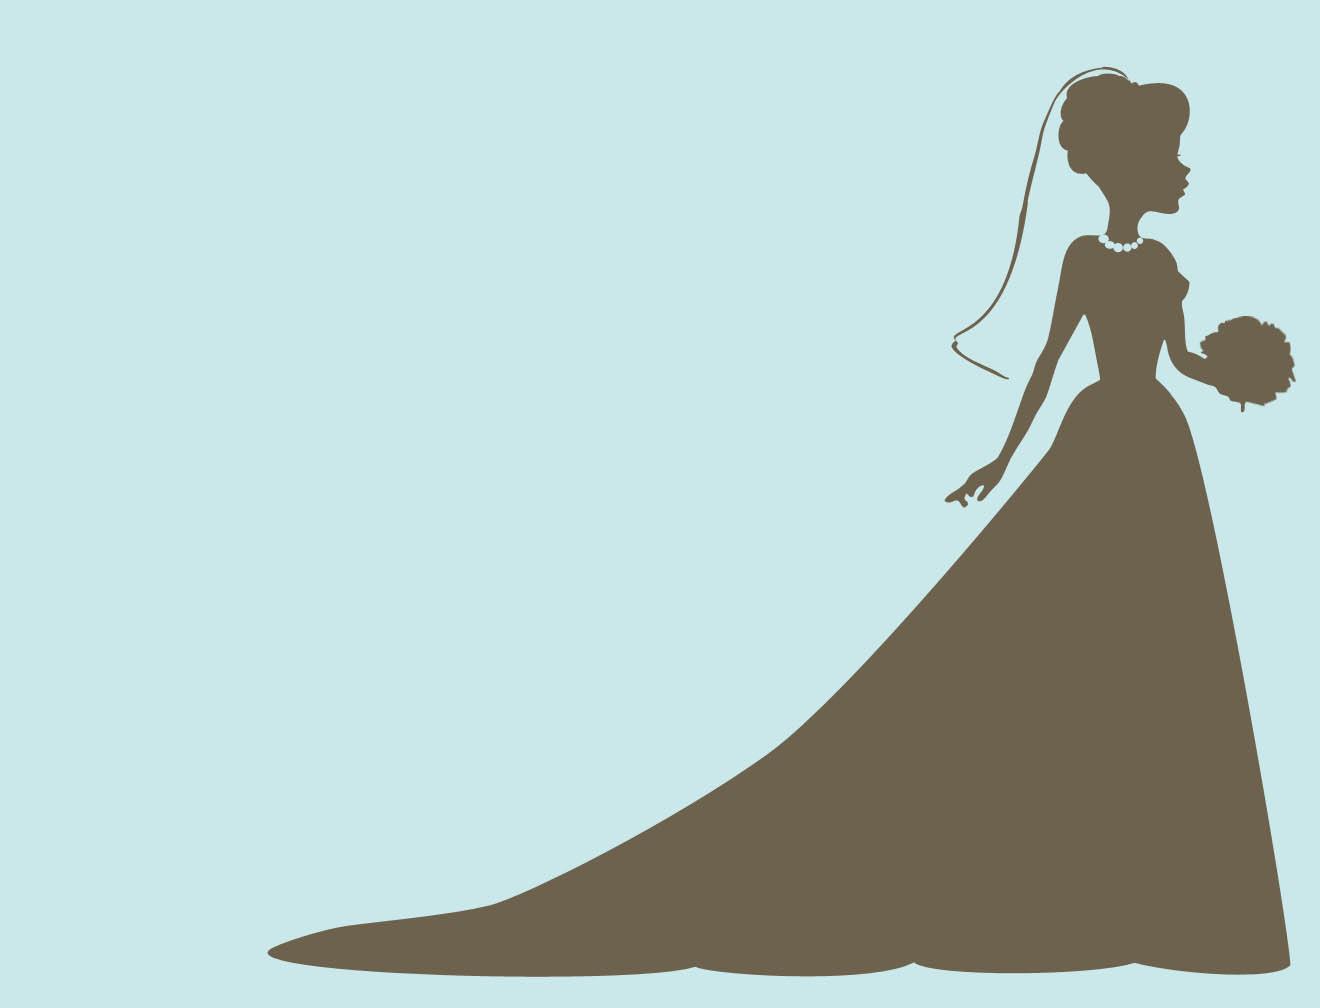 Image of Bridal Clipart 5374, Bridal Shower Clip Art.